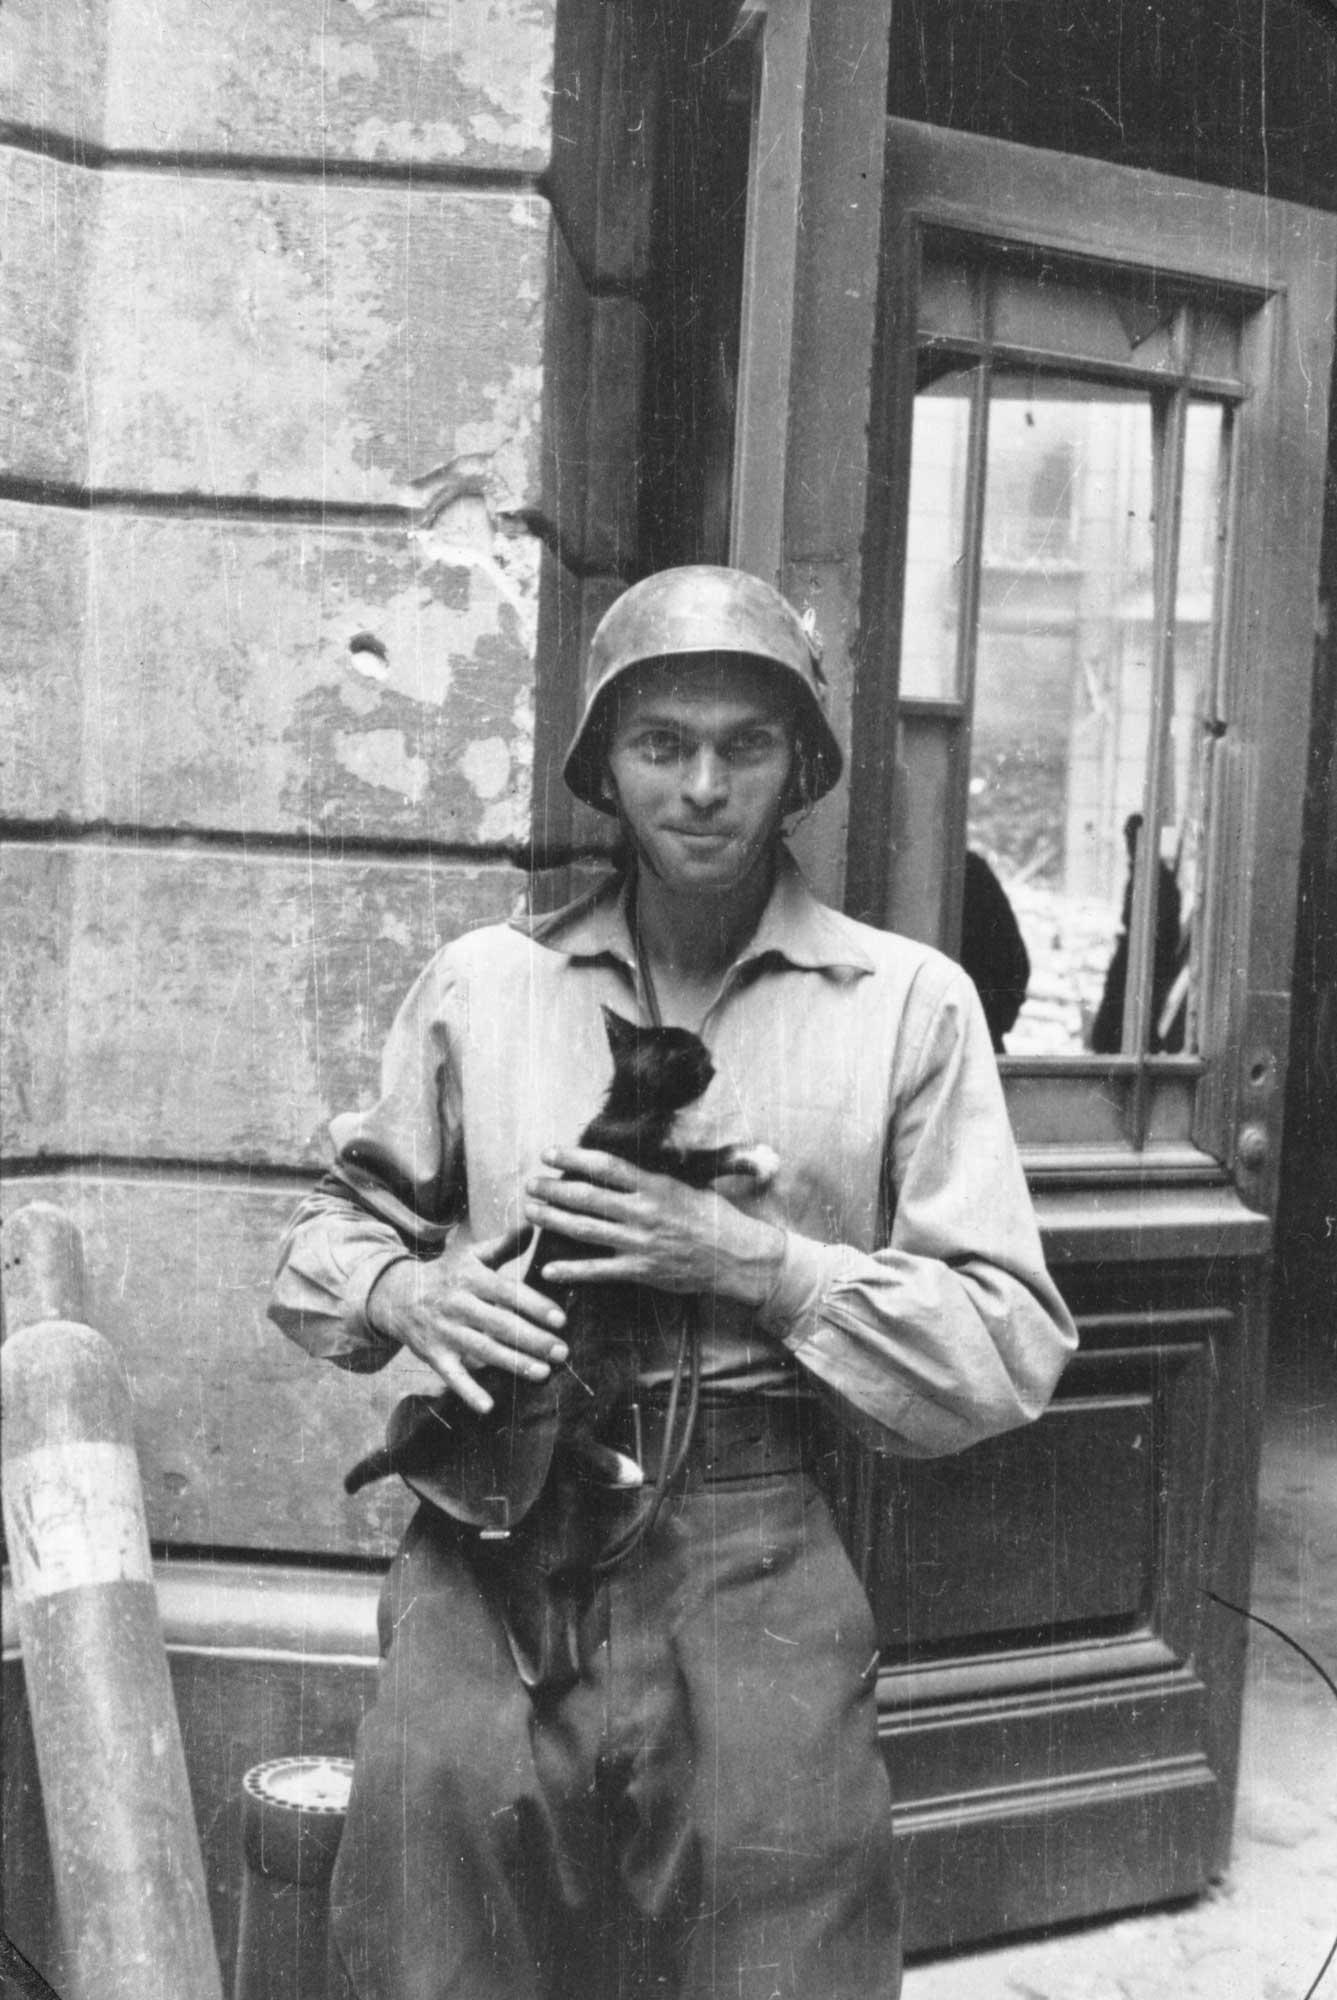 https://i0.wp.com/upload.wikimedia.org/wikipedia/commons/e/ed/Warsaw_Uprising_by_Lokajski_-_Eugeniusz_Lokajski_with_cat.jpg